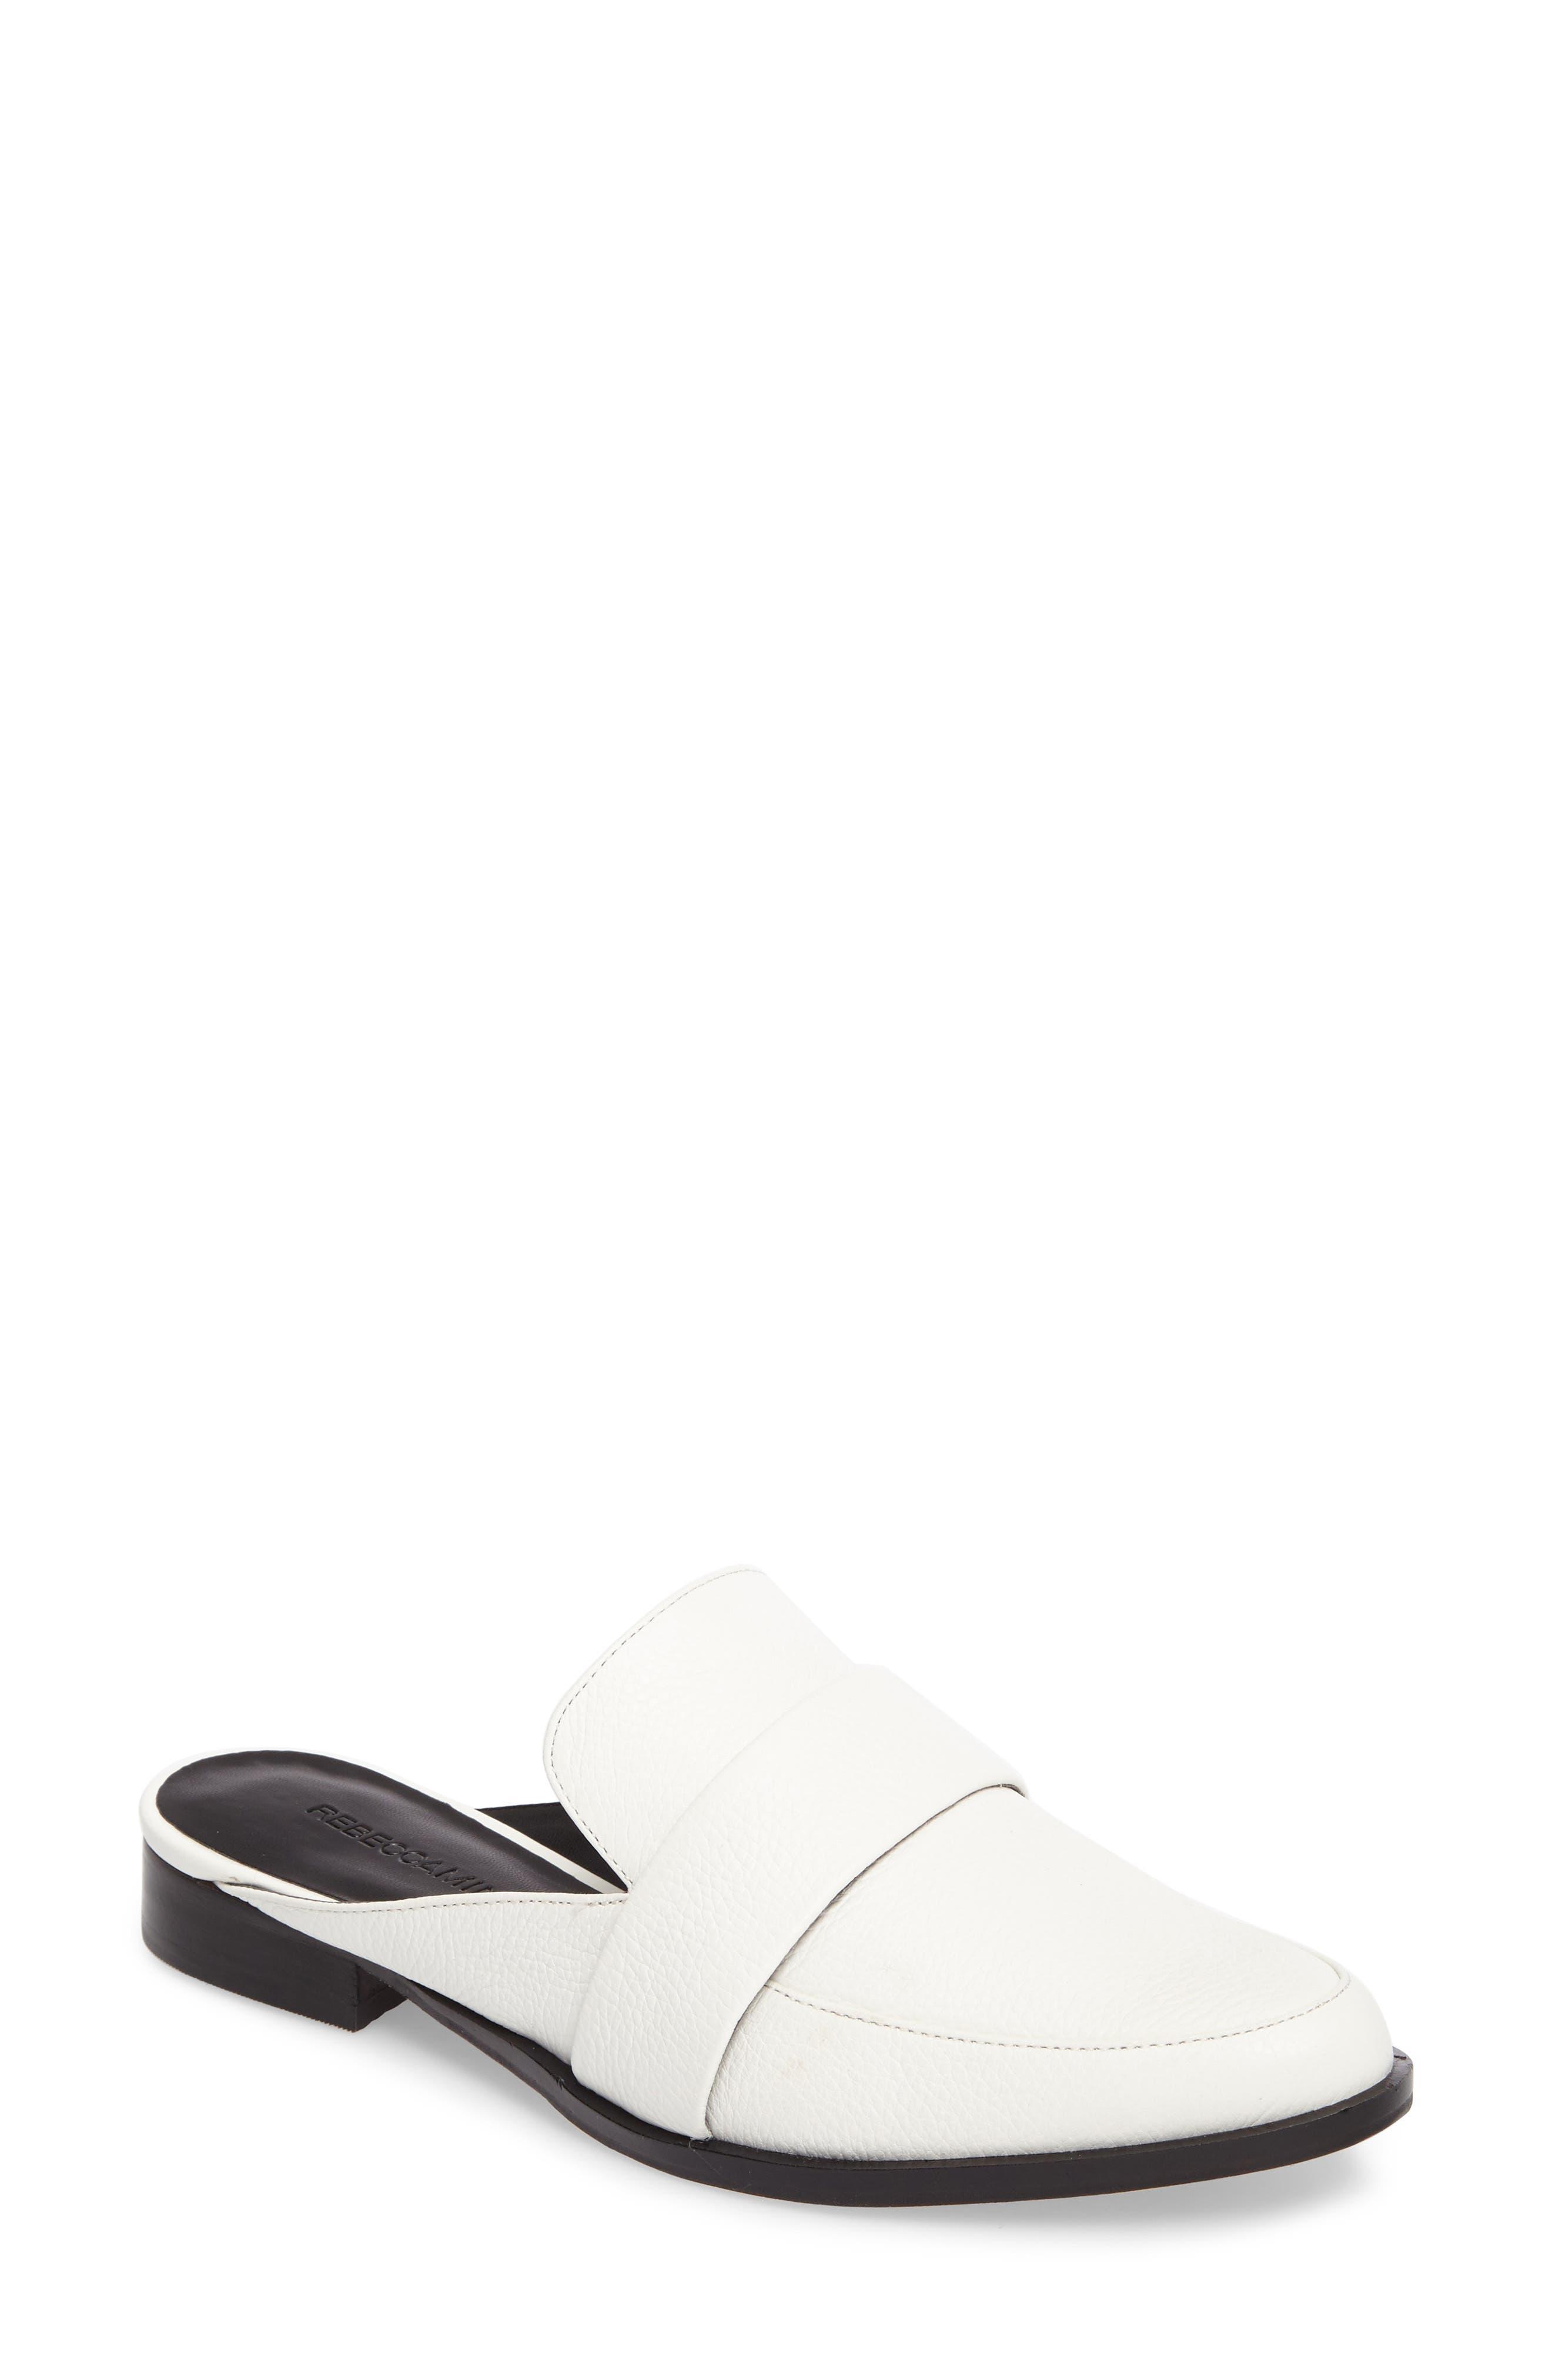 'Mika' Mule,                         Main,                         color, White Leather